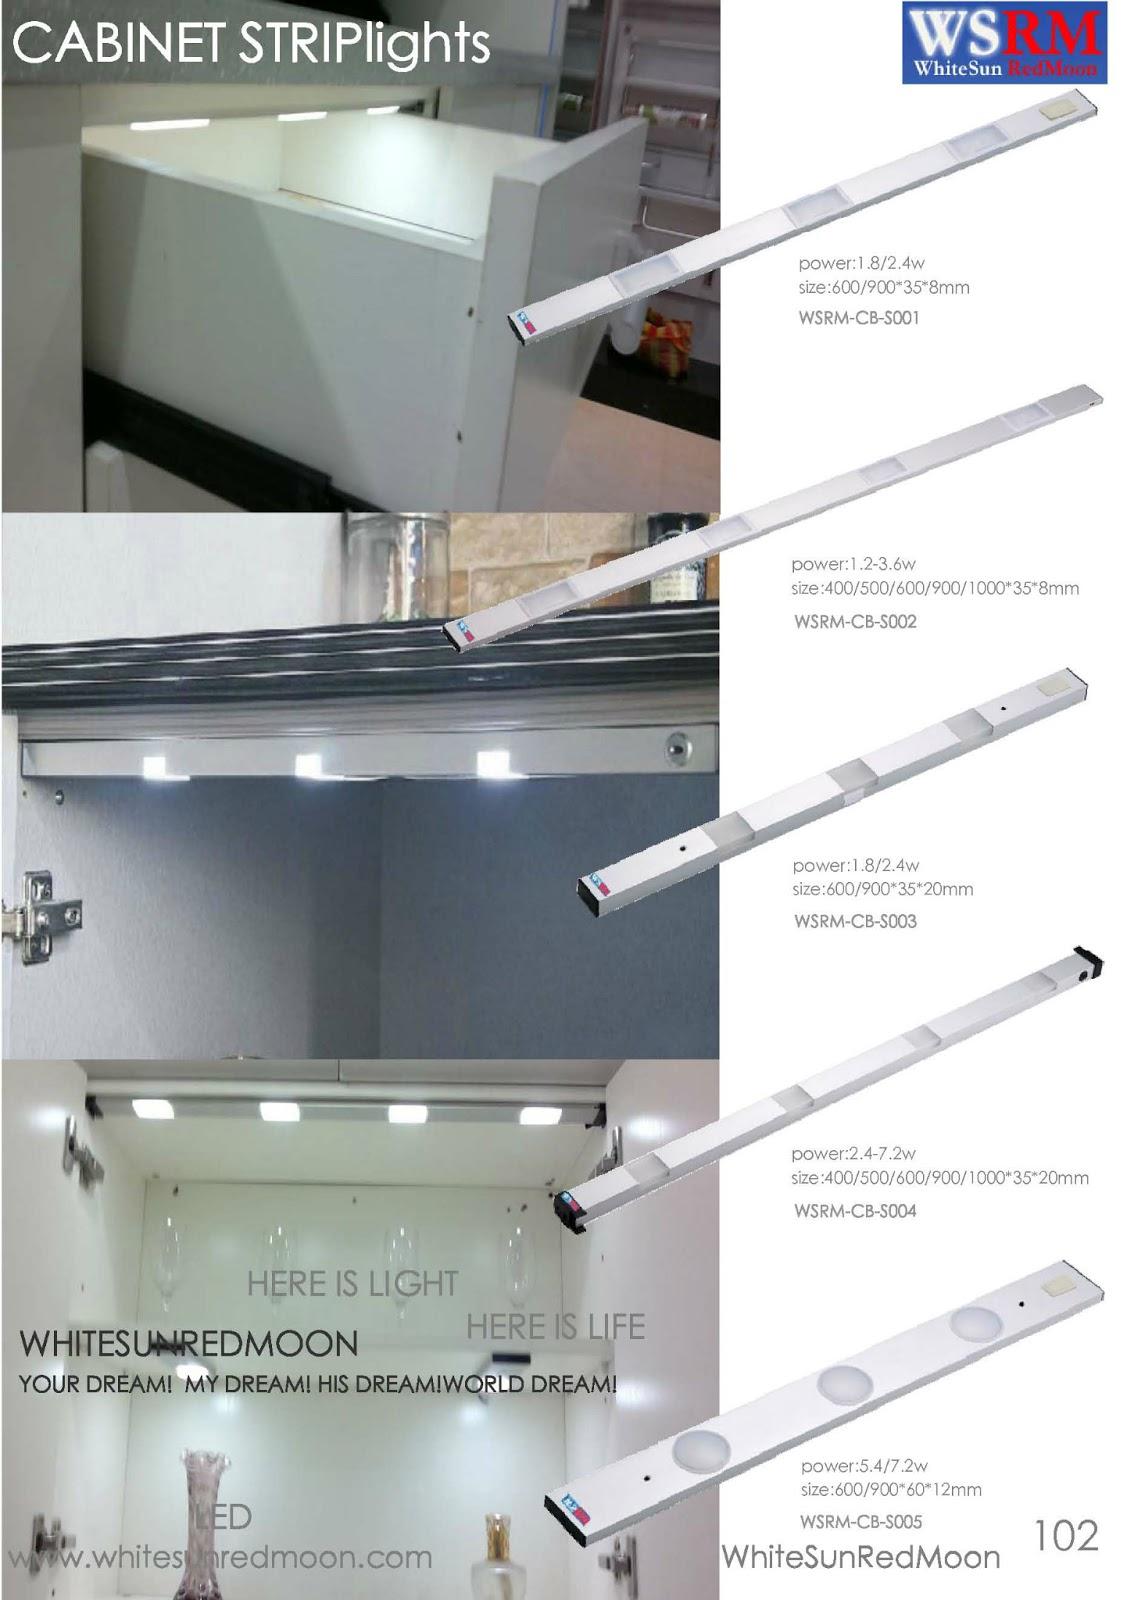 Hard Wire Cabinet Lighting Ledlights Wsrm How Choose Under B